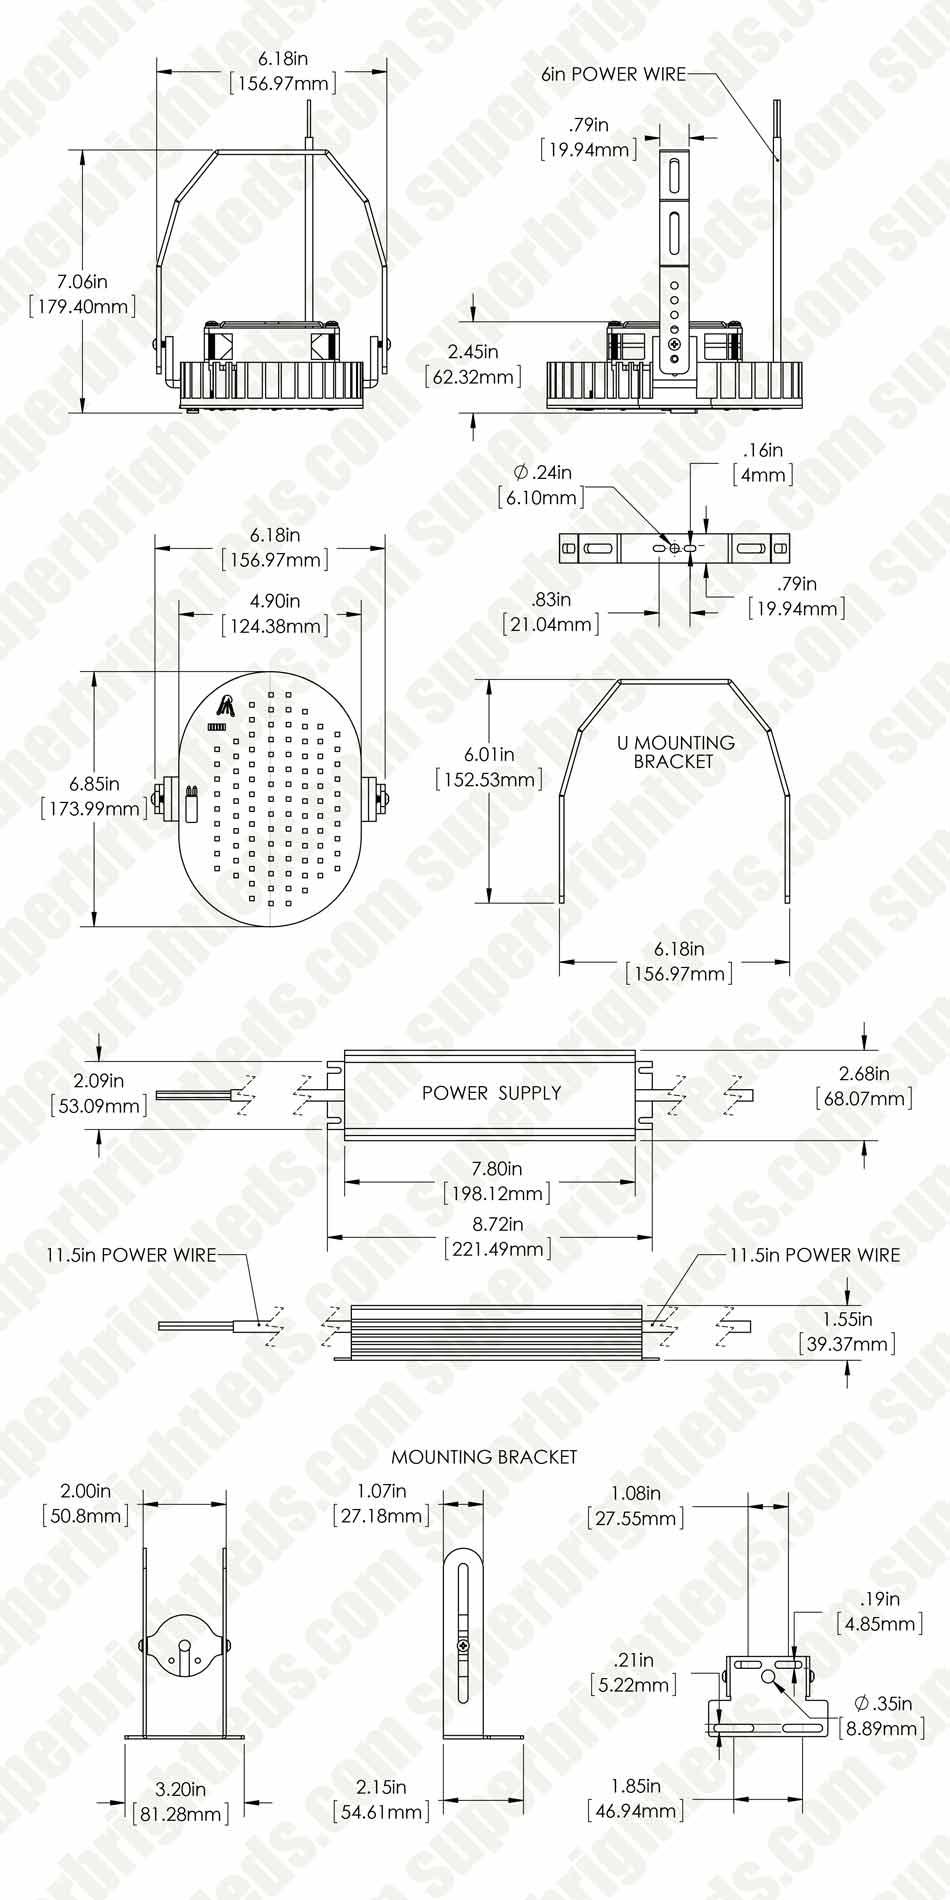 100w Led Retrofit Kit For 250w Metal Halide 12900 Lumens 5000k 480 Volt Wiring Diagram